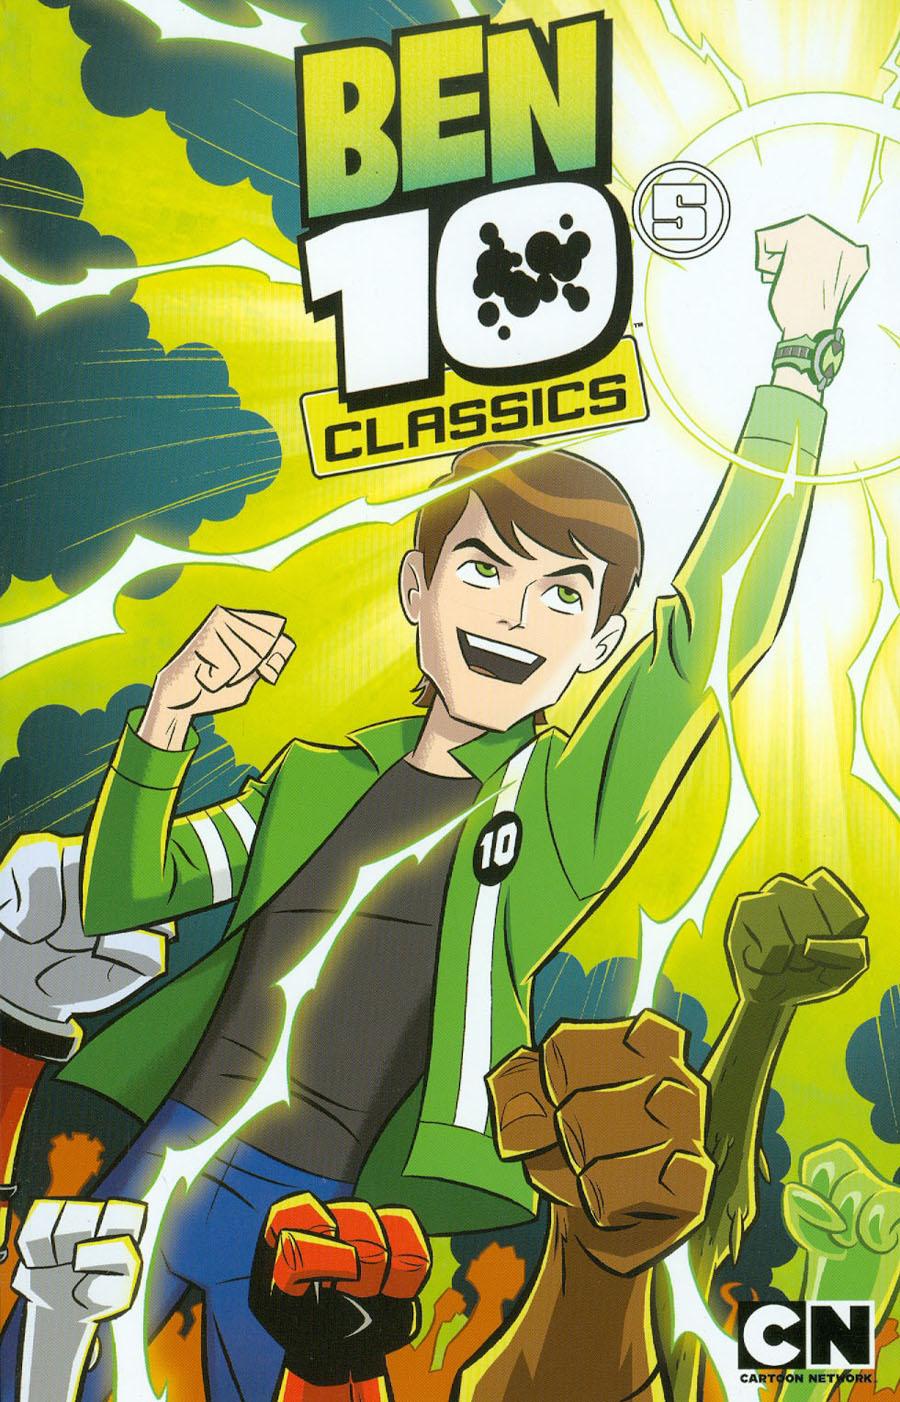 Ben 10 Classics Vol 5 Powerless TP